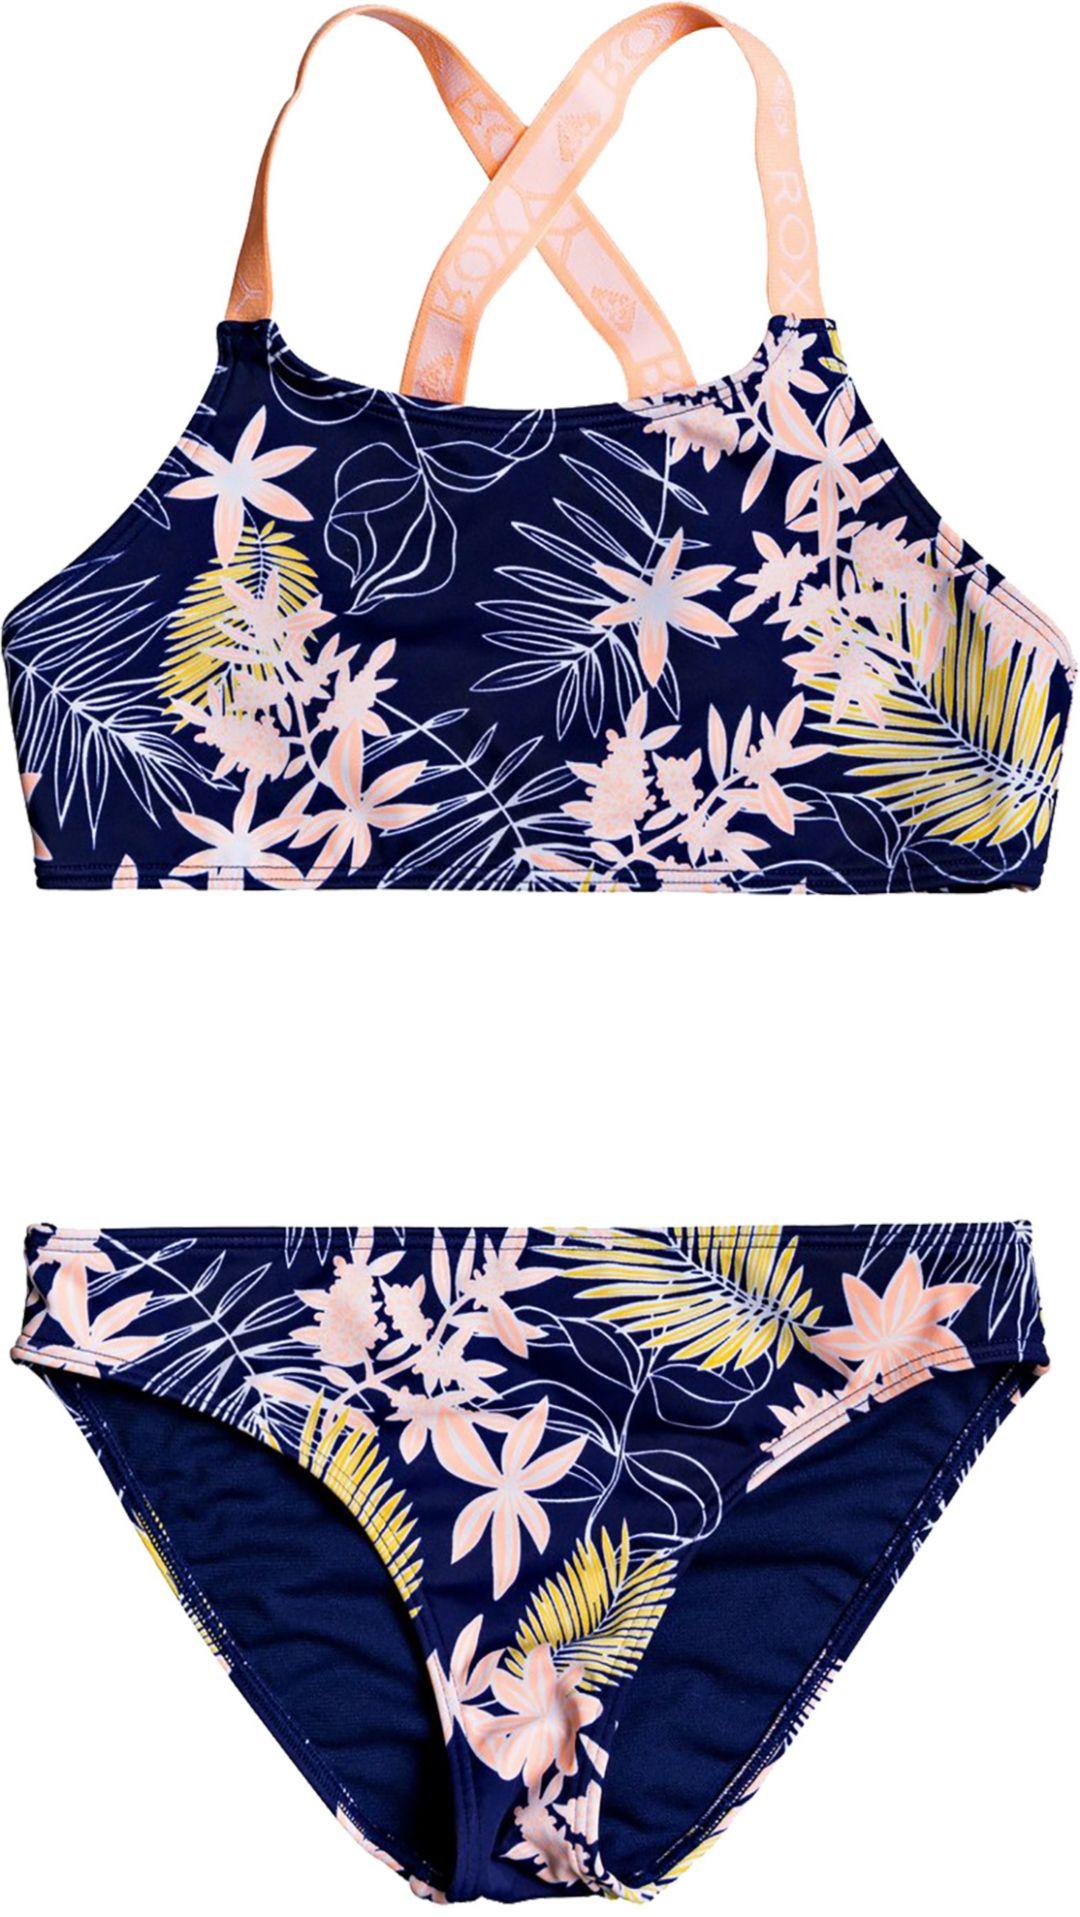 dcb7f61e23da Roxy Girls' Bikini Point Crop Top Set | DICK'S Sporting Goods